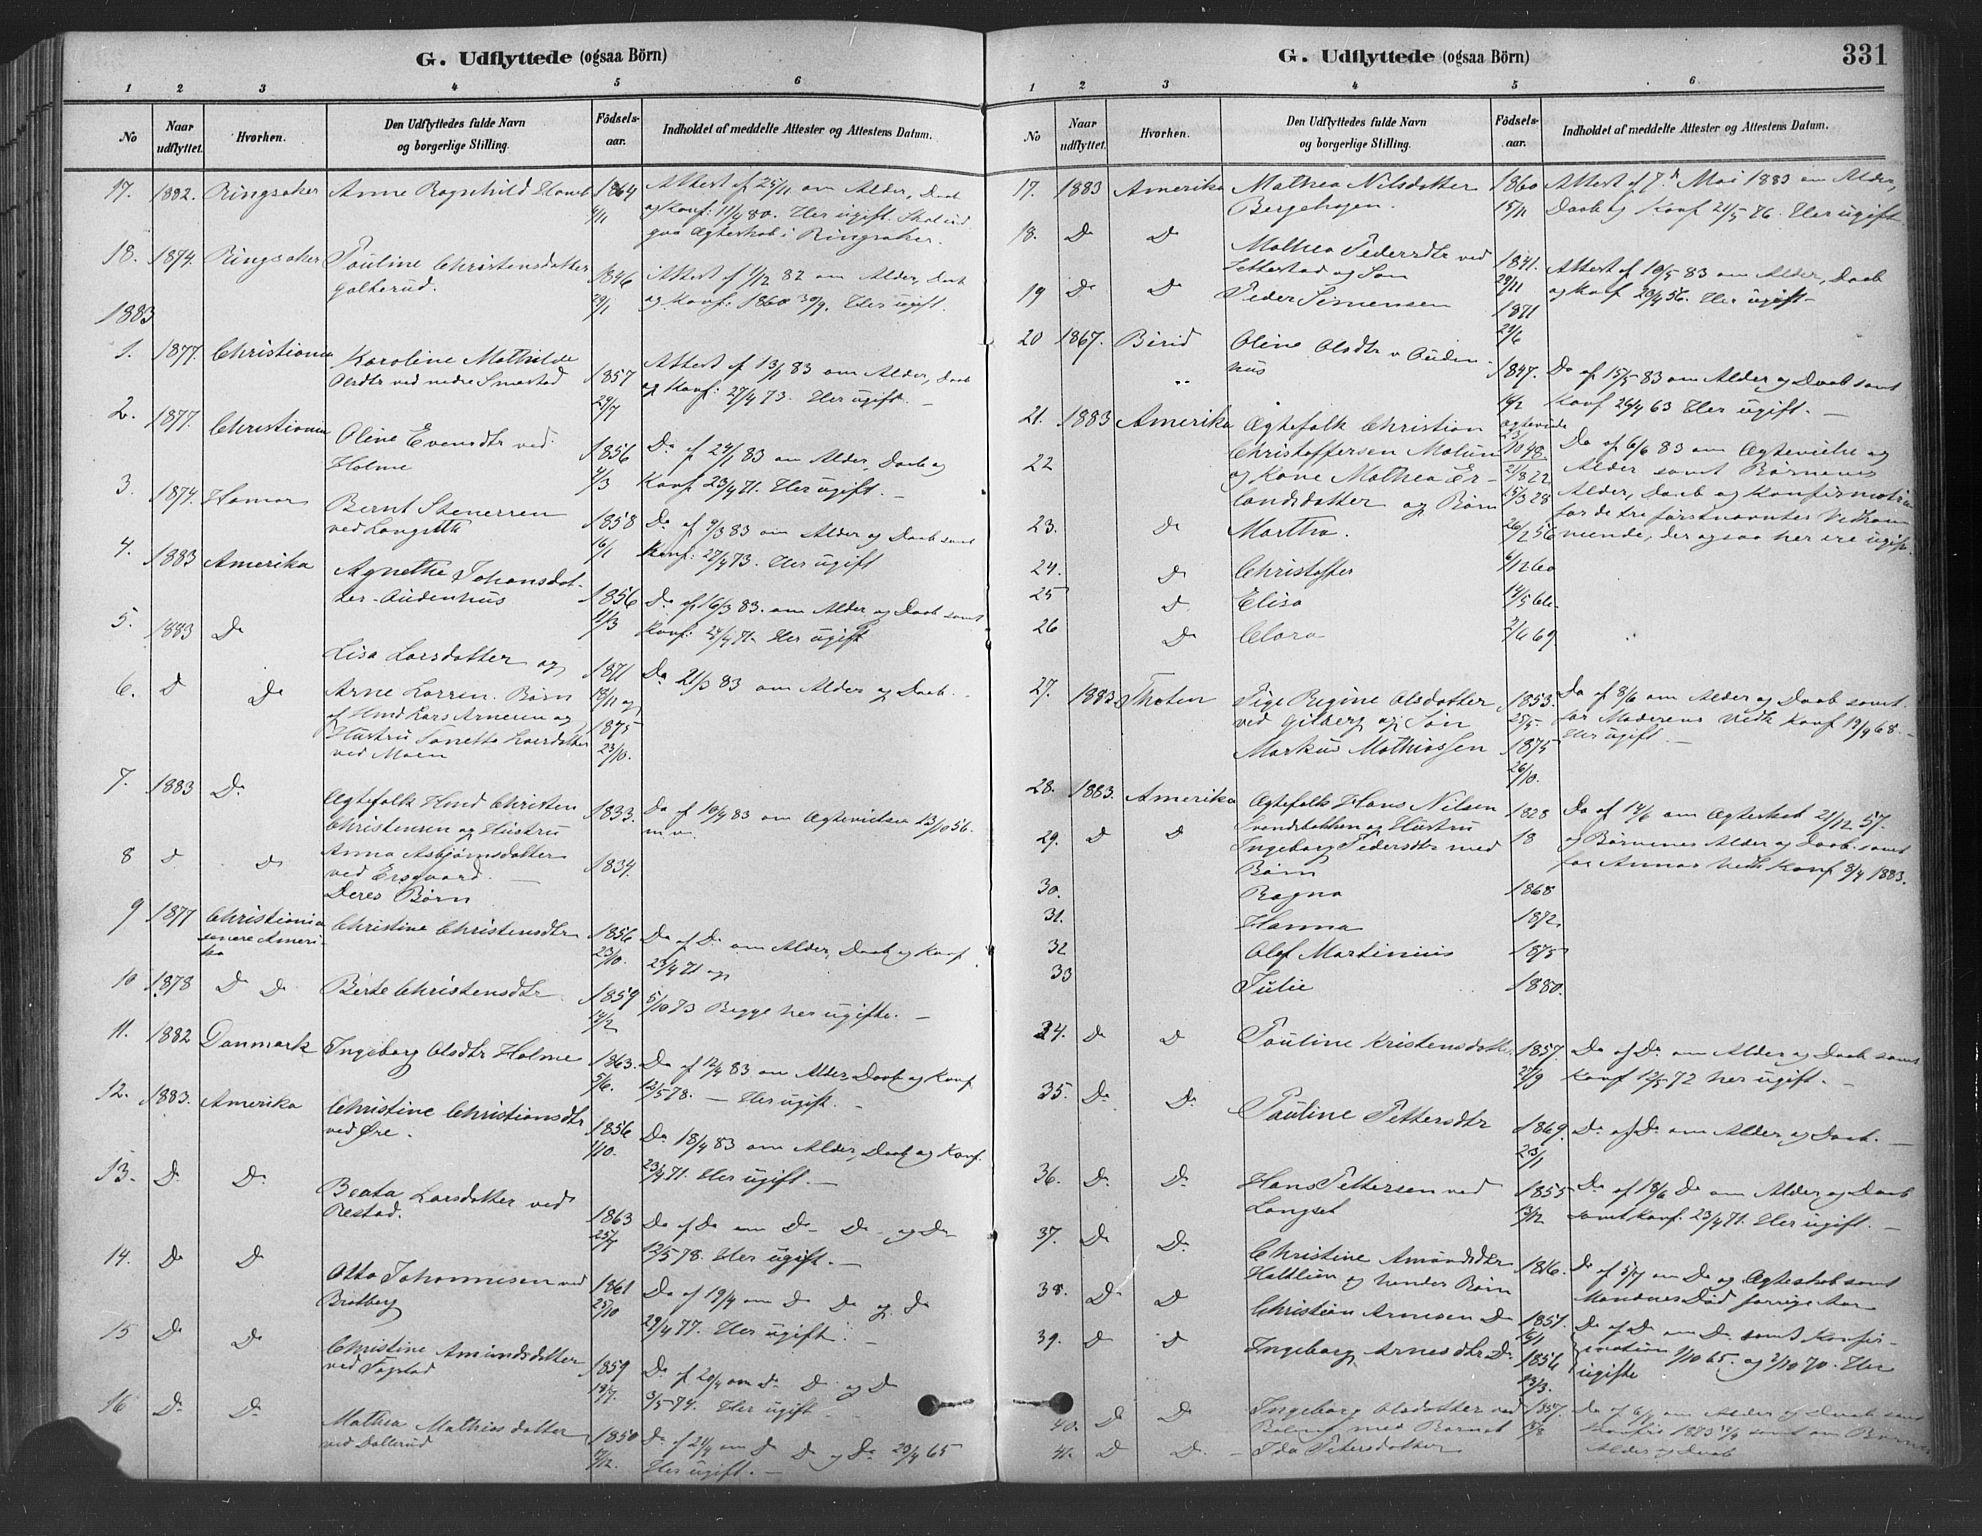 SAH, Fåberg prestekontor, Ministerialbok nr. 9, 1879-1898, s. 331